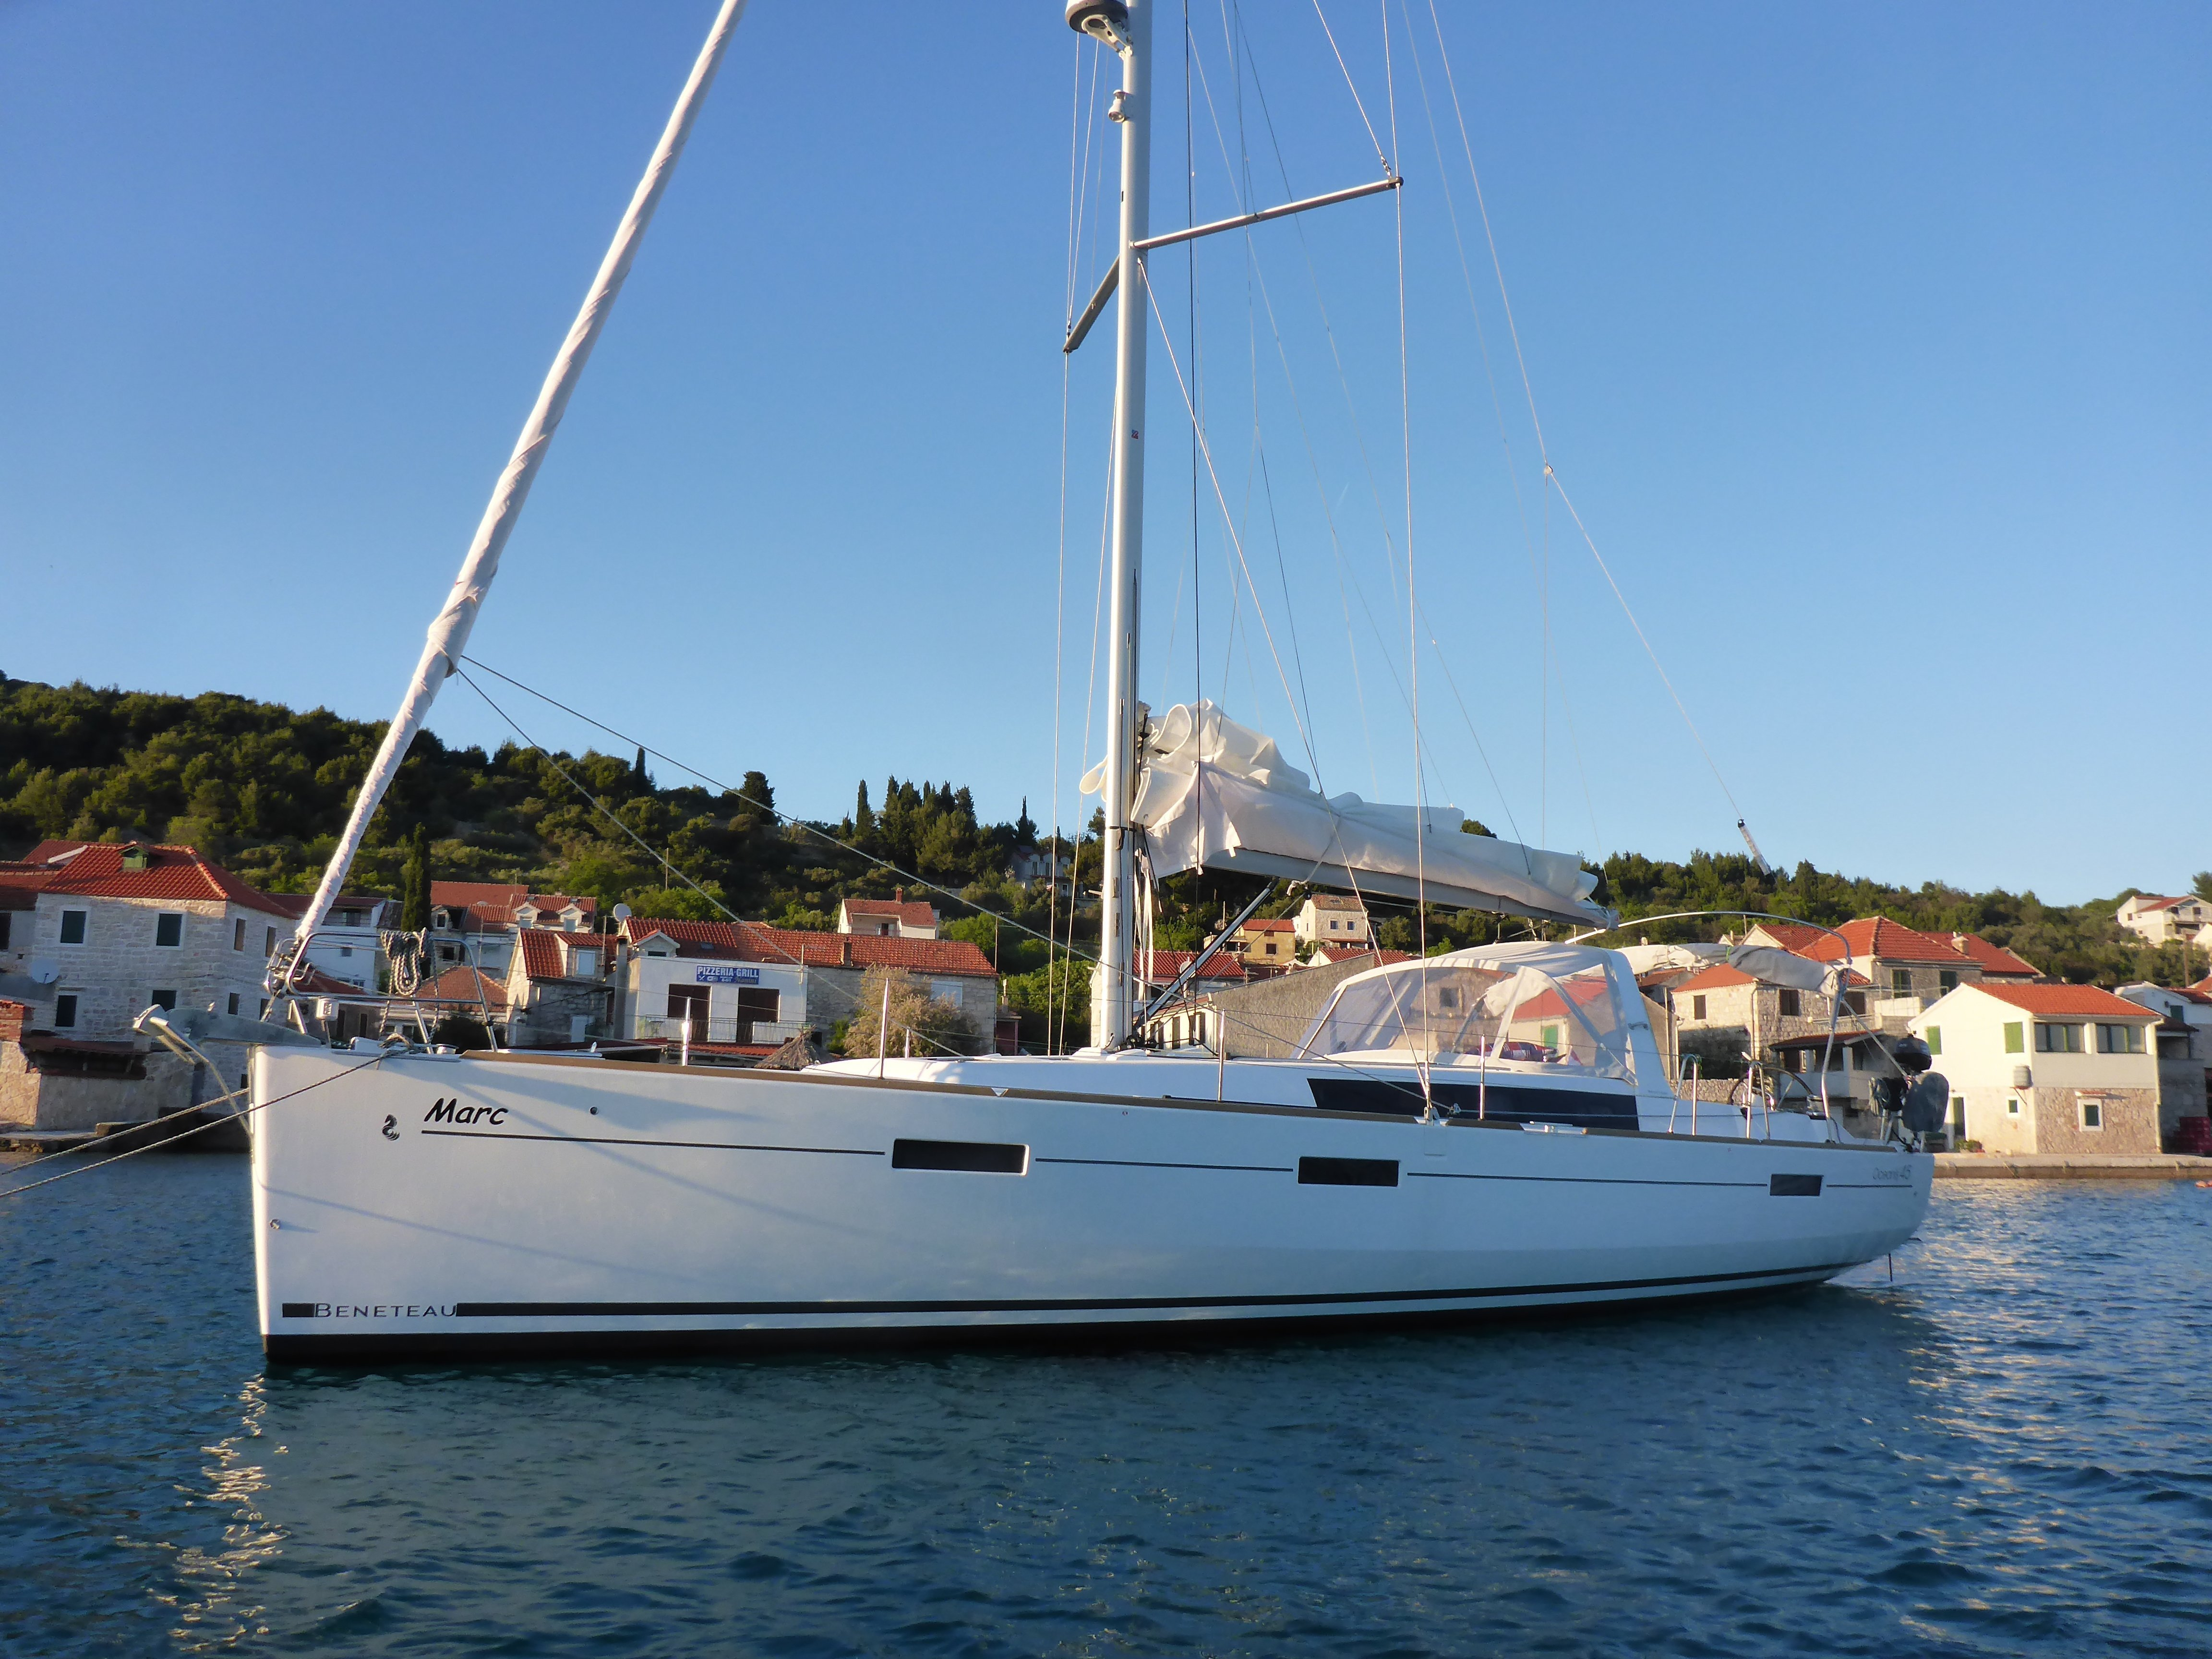 Oceanis 45 3 cabins (Marc)  - 9